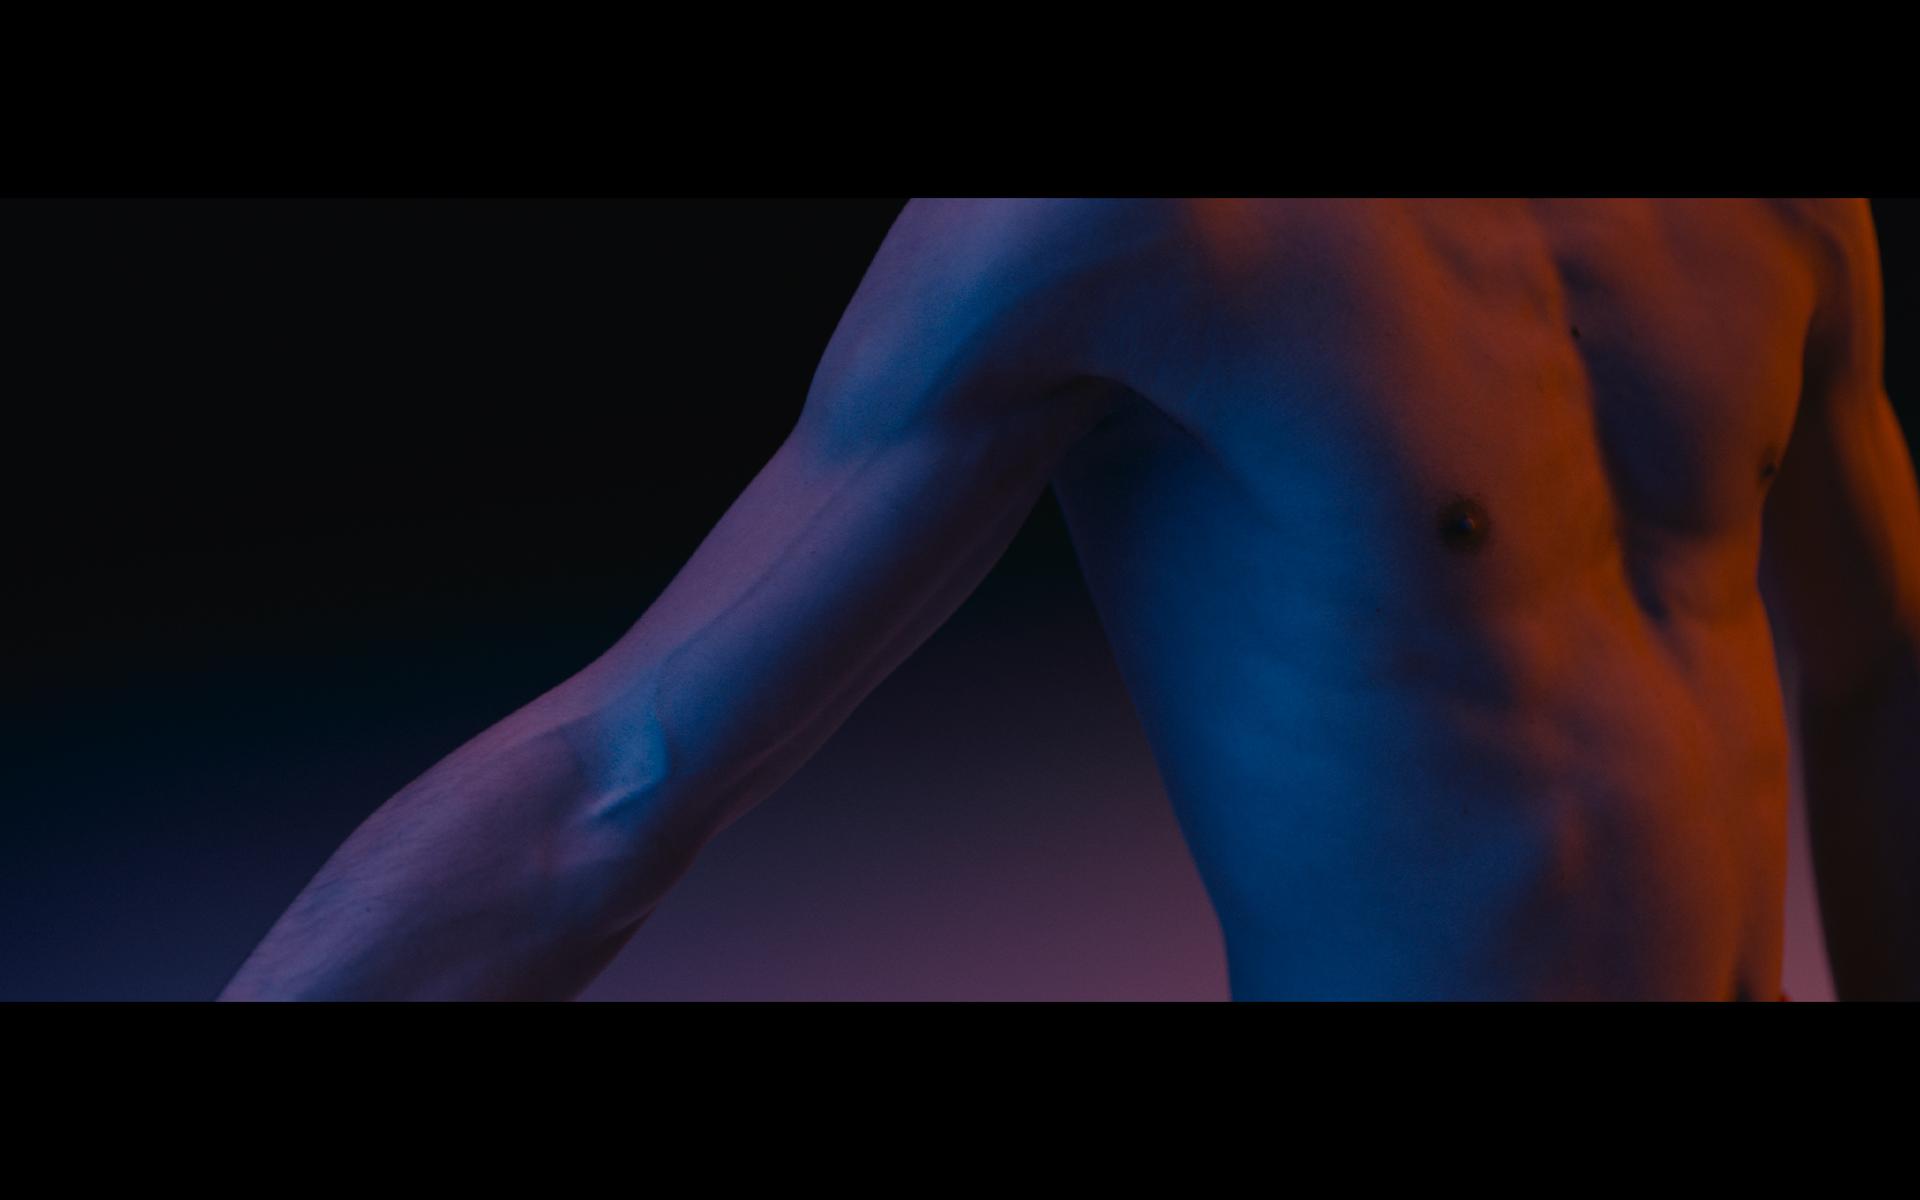 KYLE MACFADZEAN - Screenshot 2019-11-27 at 14.38.20